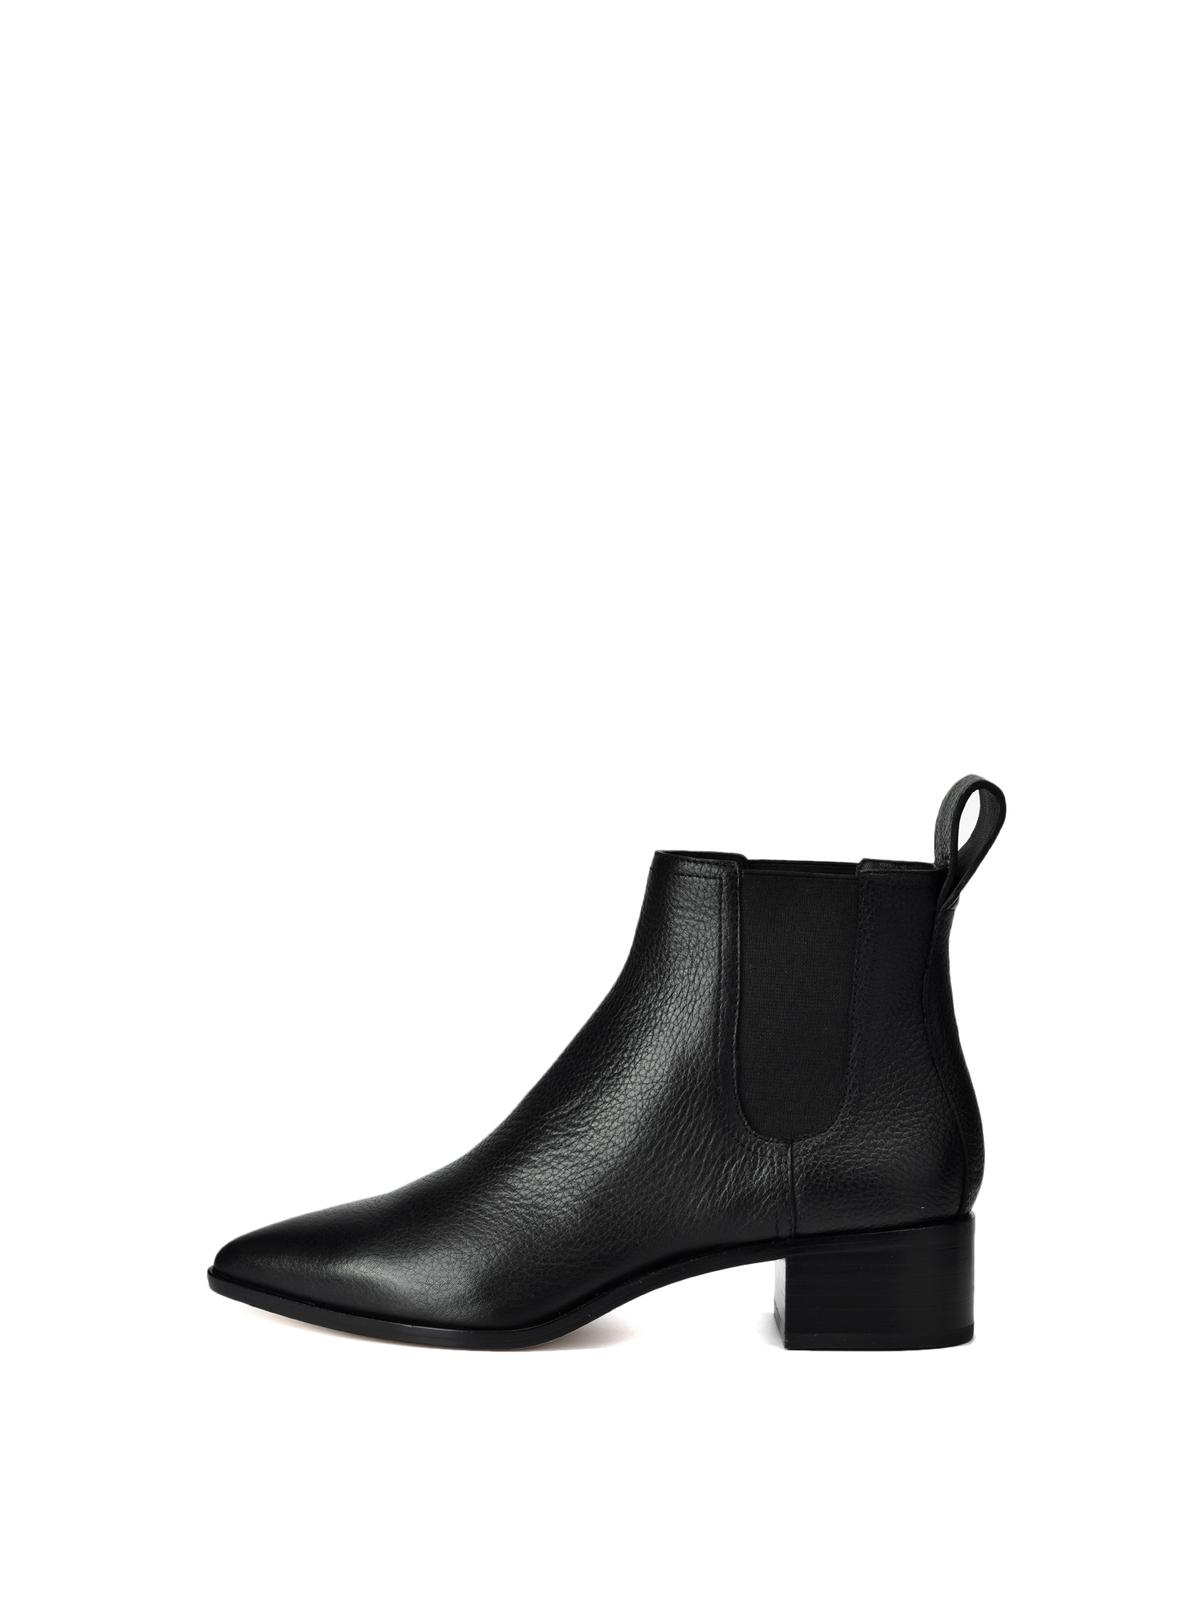 95d1d711d52 Loeffler Randall Nellie Tumbled Leather Chelsea Boots | Garmentory